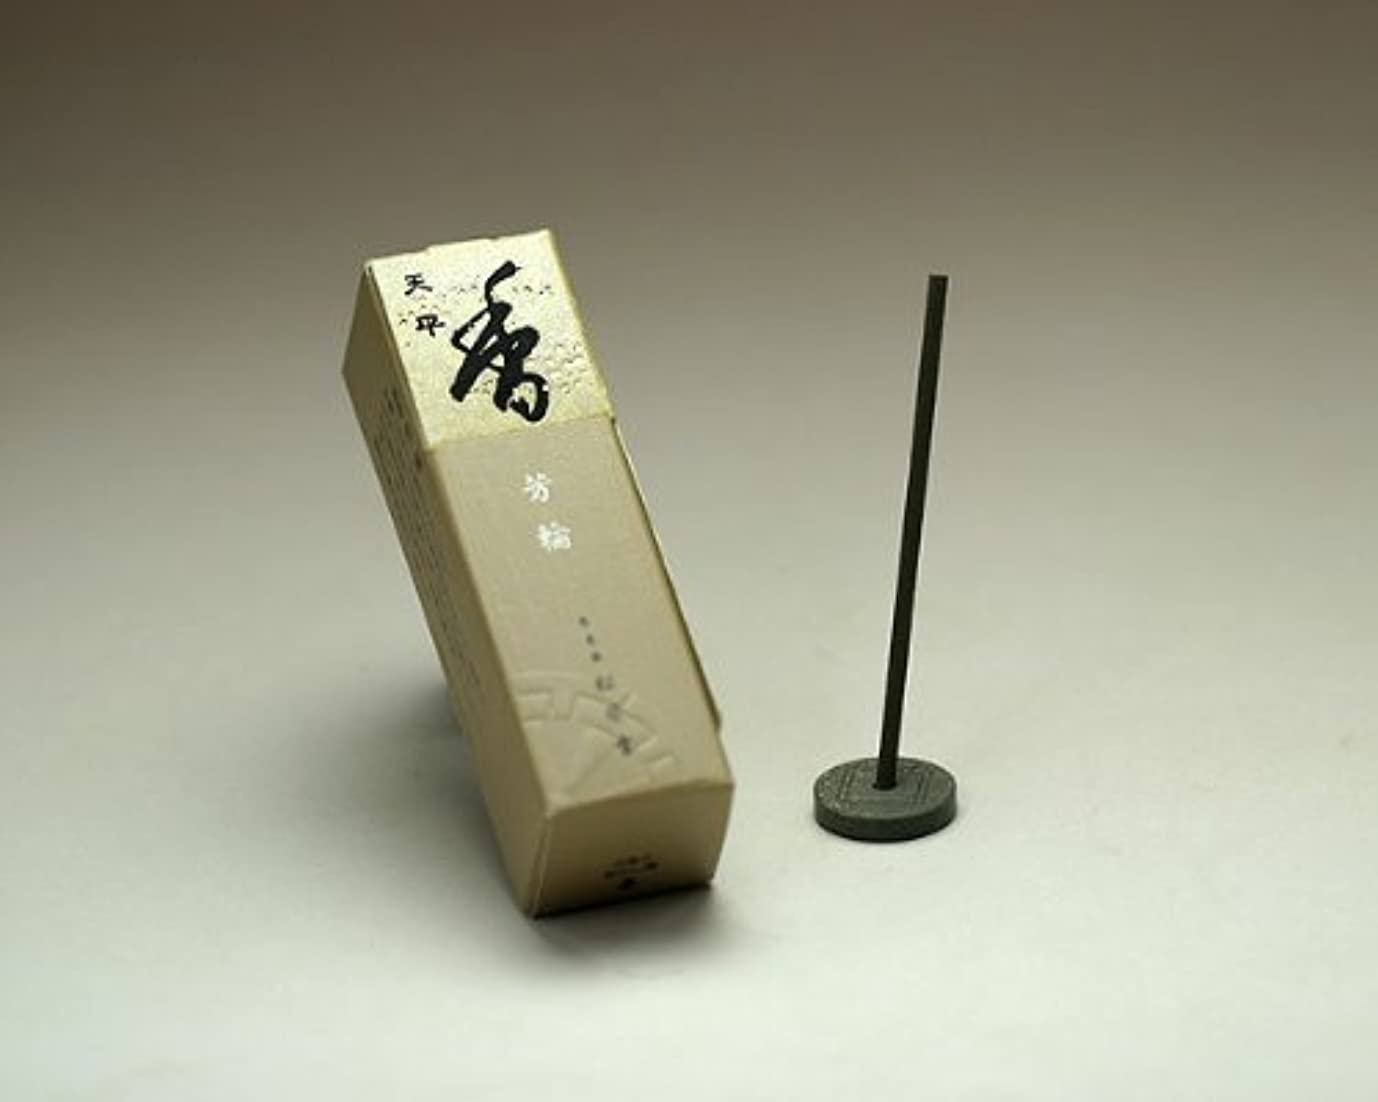 単語巨大な急速な銘香芳輪 松栄堂のお香 芳輪天平 ST20本入 簡易香立付 #210523